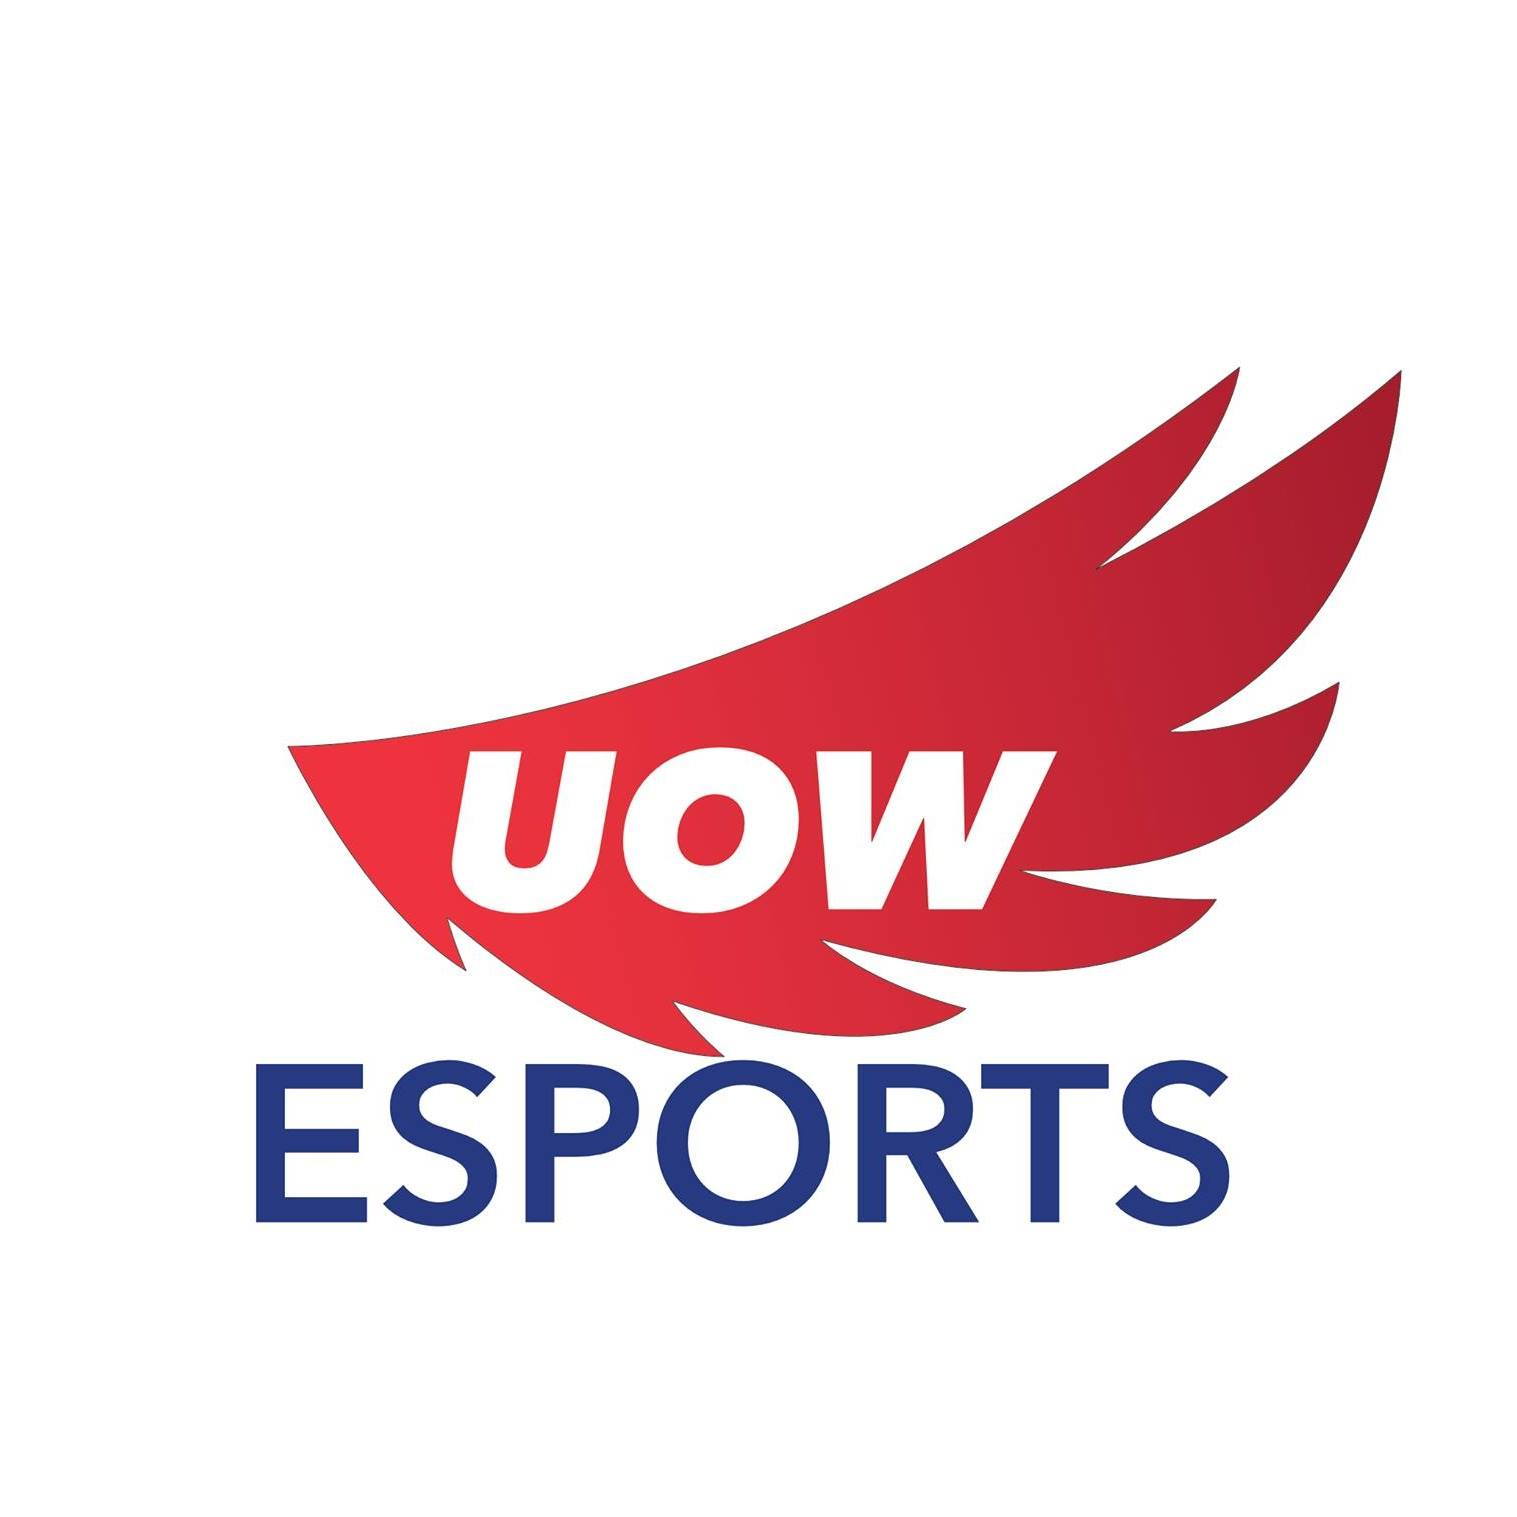 UniClubs -UOW Esports Logo